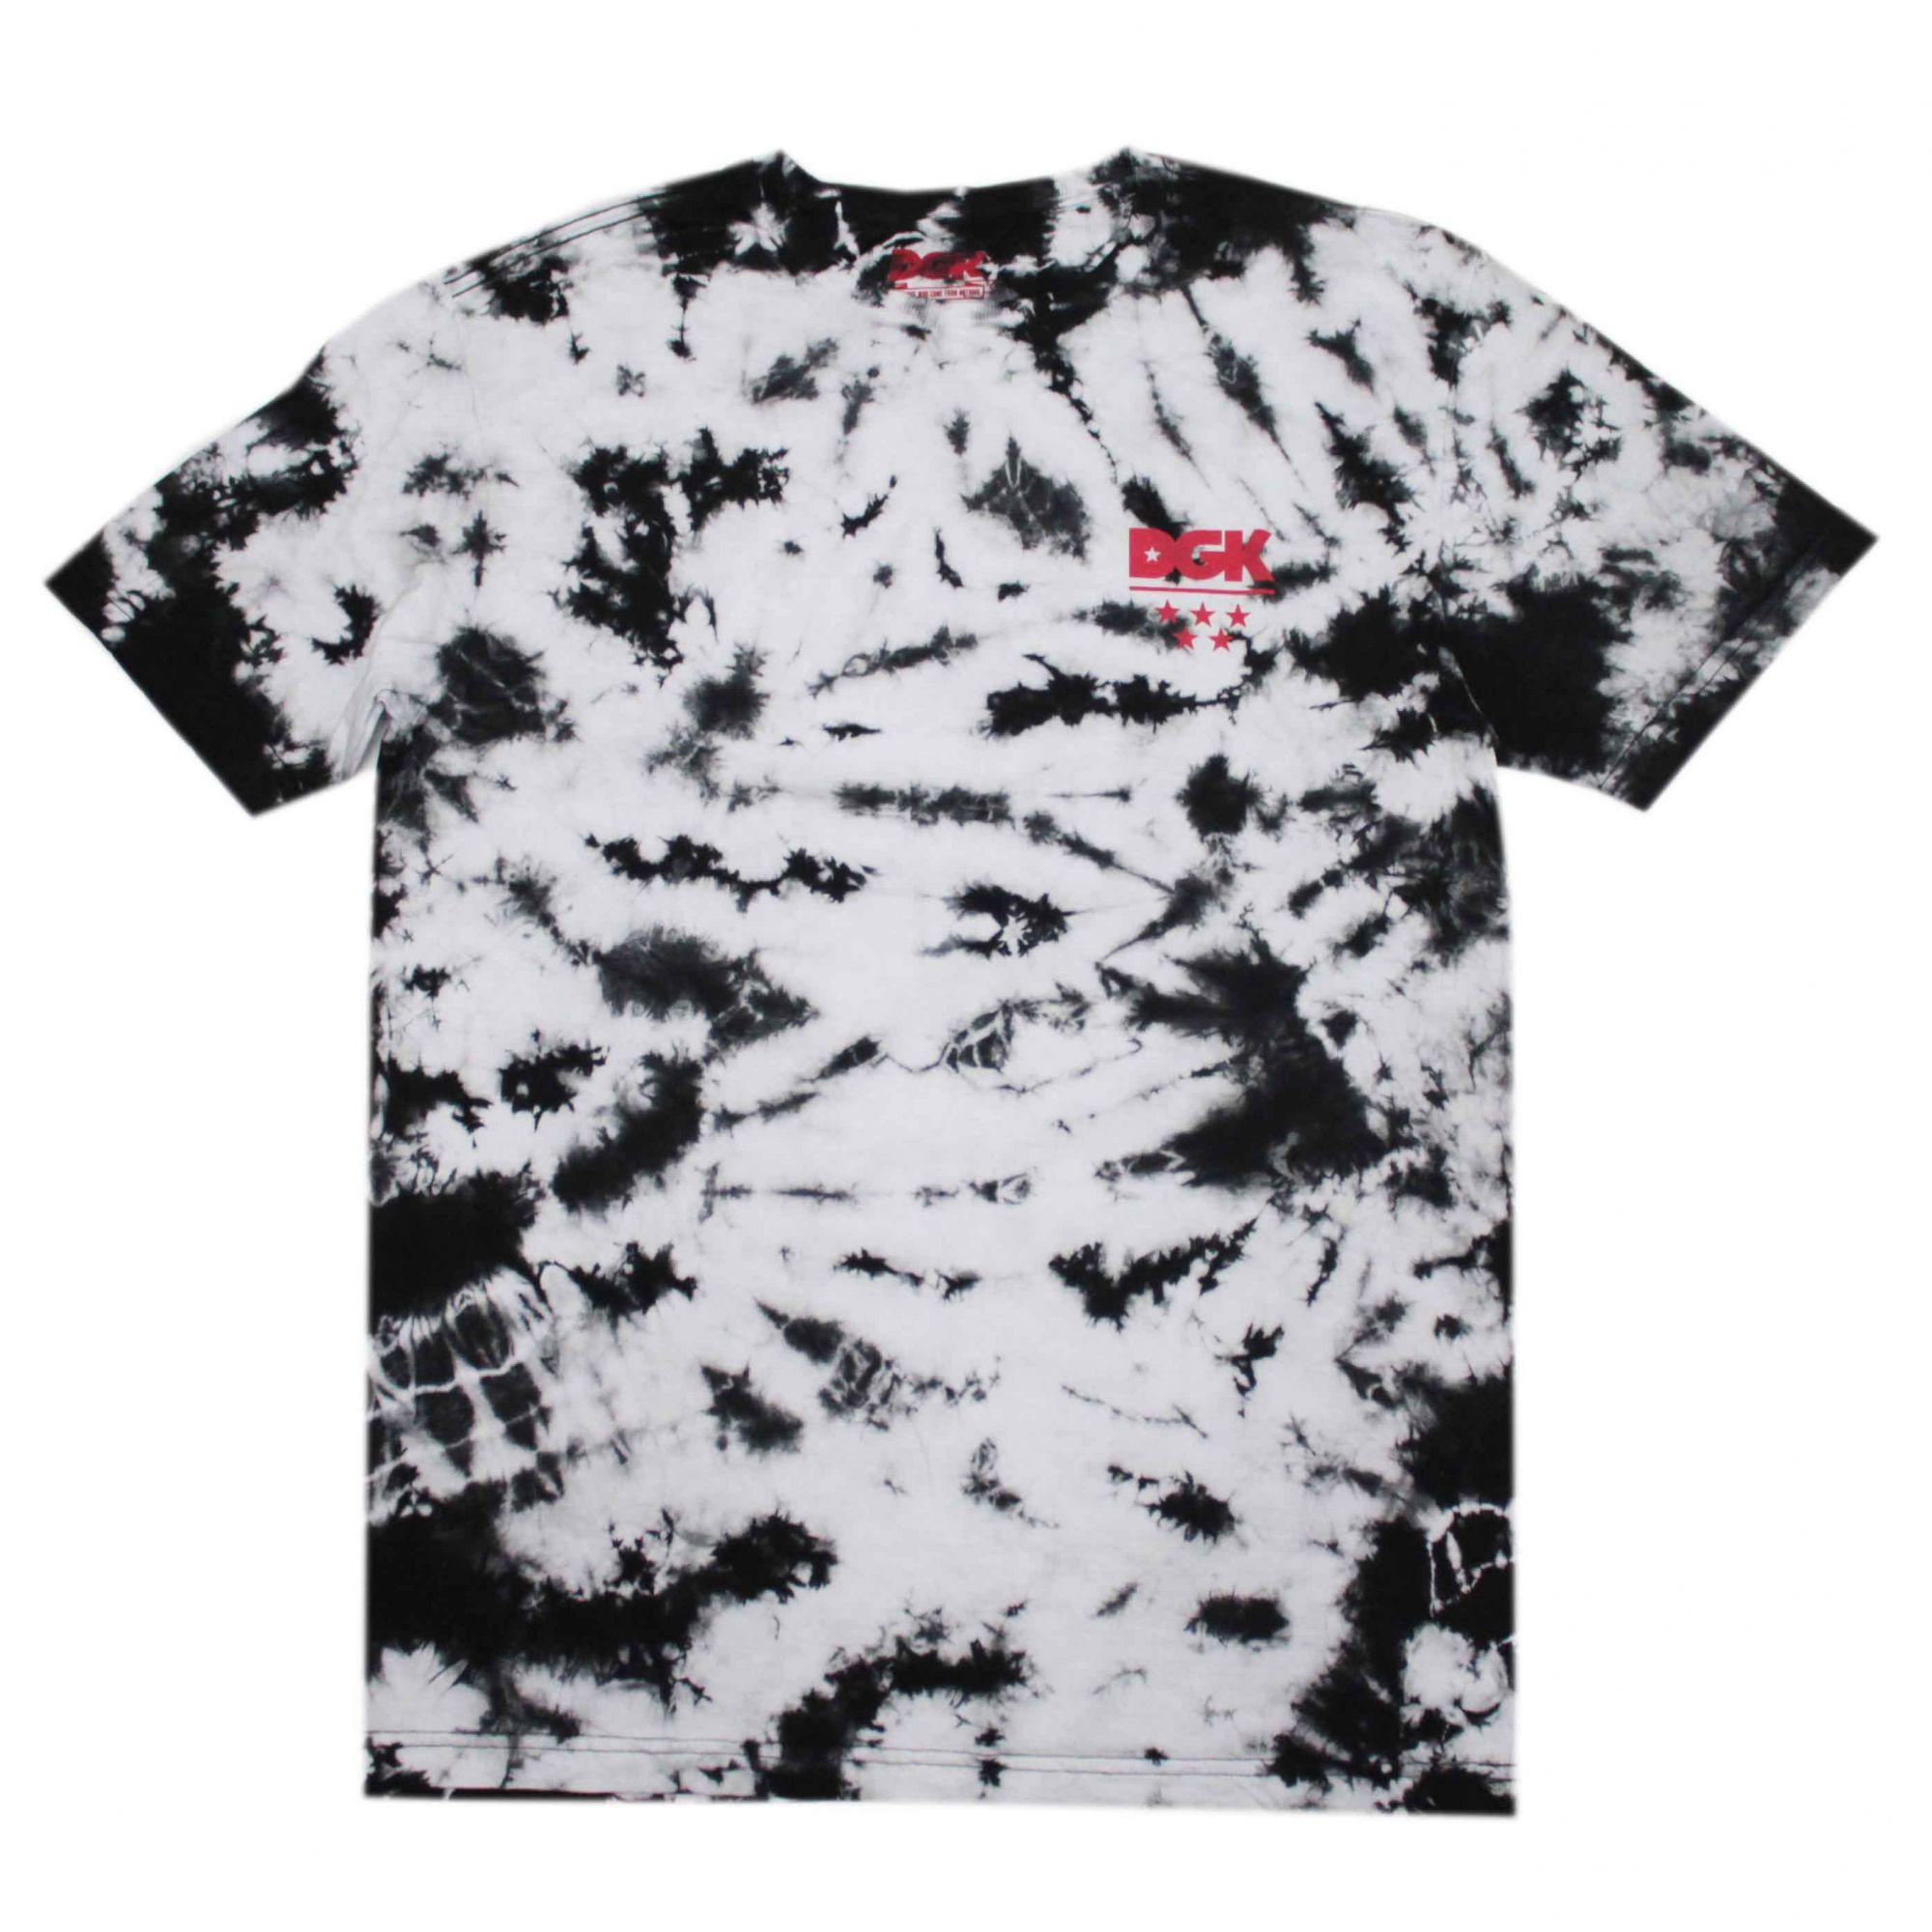 Camiseta DGK Smokey Tie Dye Preto